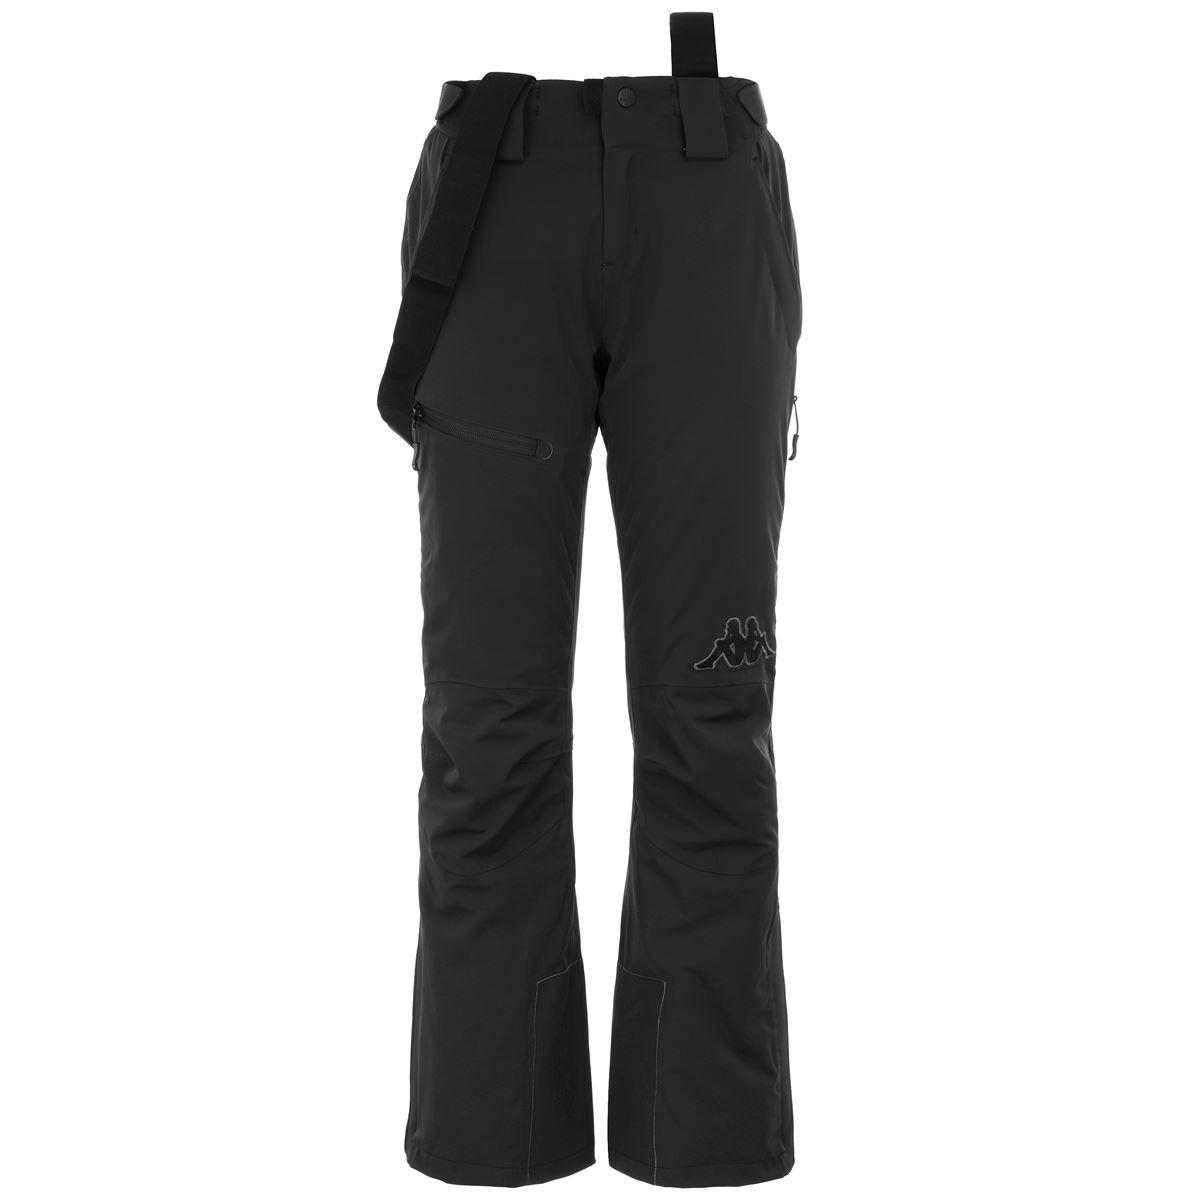 Kappa Pantaloni donna-3031V70